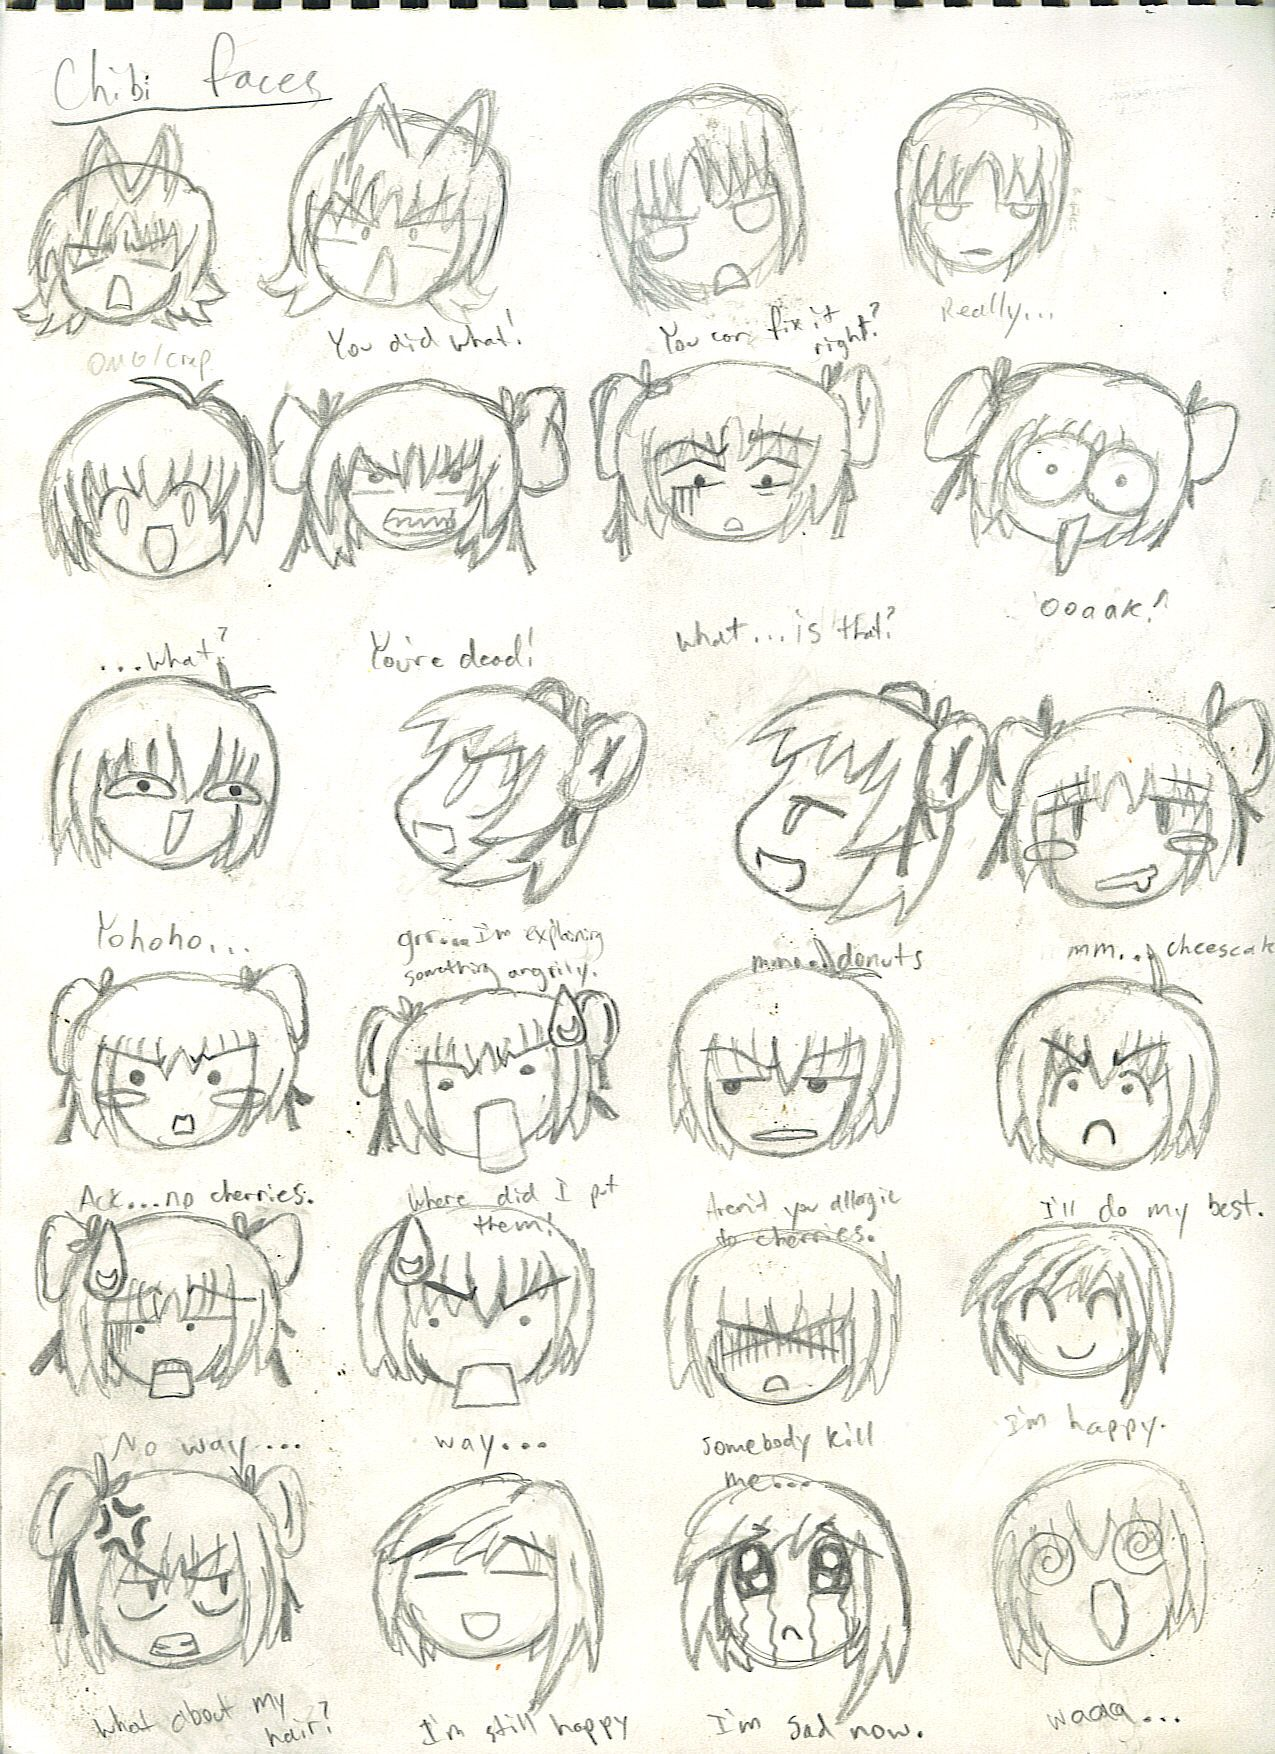 Chibi Faces 1 By Lunar Virage On Deviantart Cute Illustration